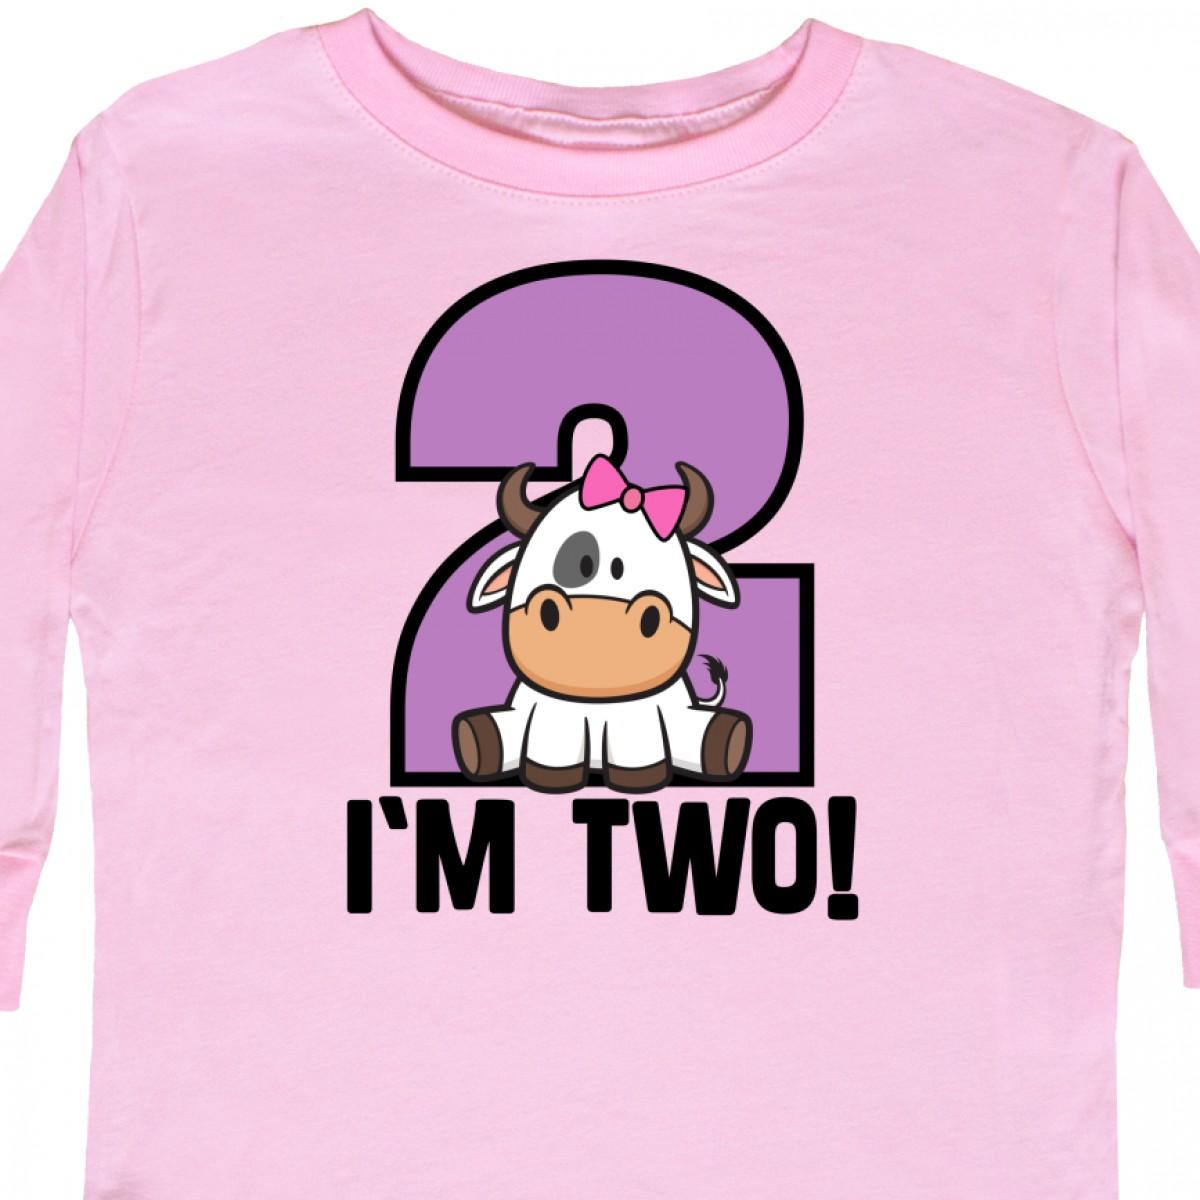 inktastic Monkey 1st Birthday Gift for Girl Toddler T-Shirt